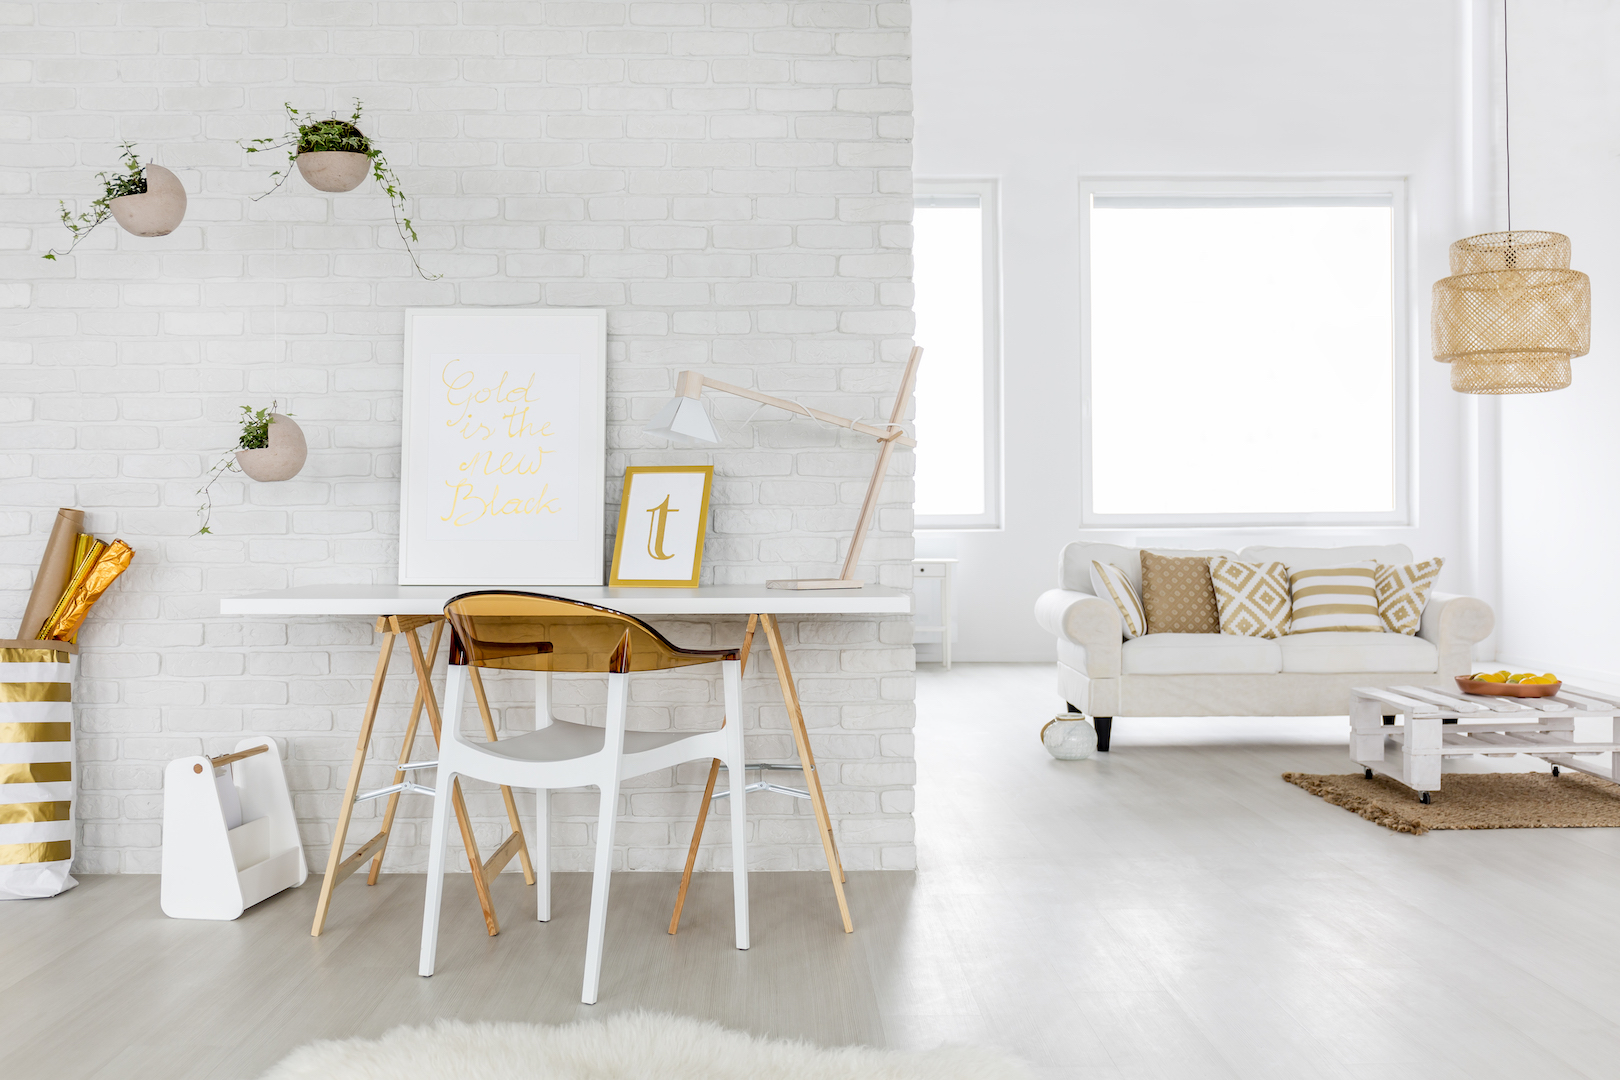 15 Best Blogs zu folgen Über Immobilien